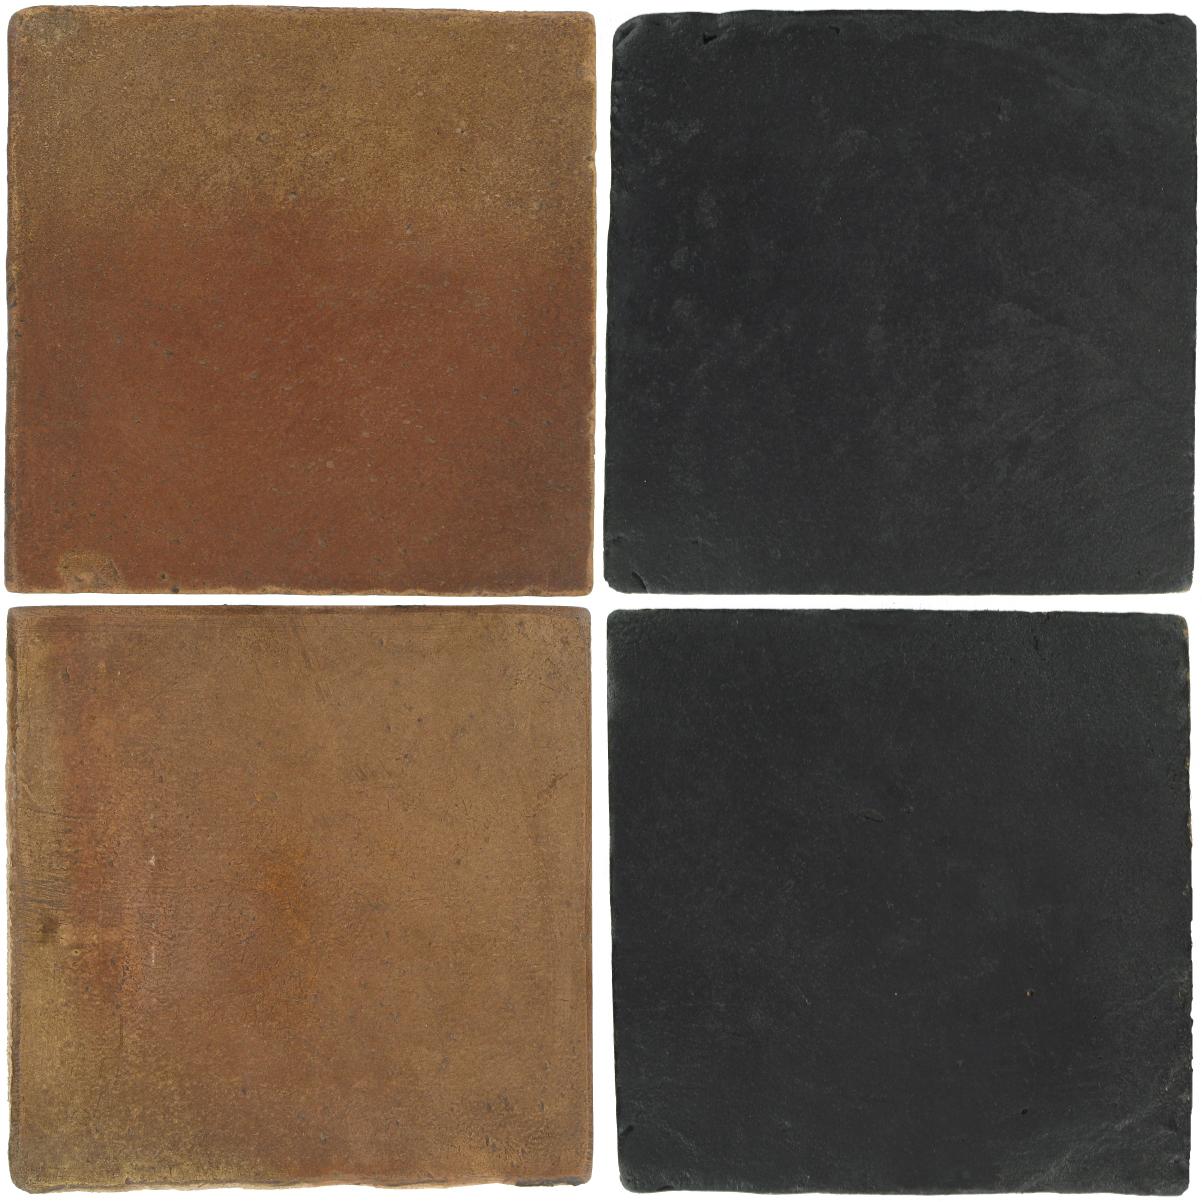 Pedralbes Antique Terracotta  2 Color Combinations  OHS-PSCM Camel Brown + VTG-PGCB Carbon Black